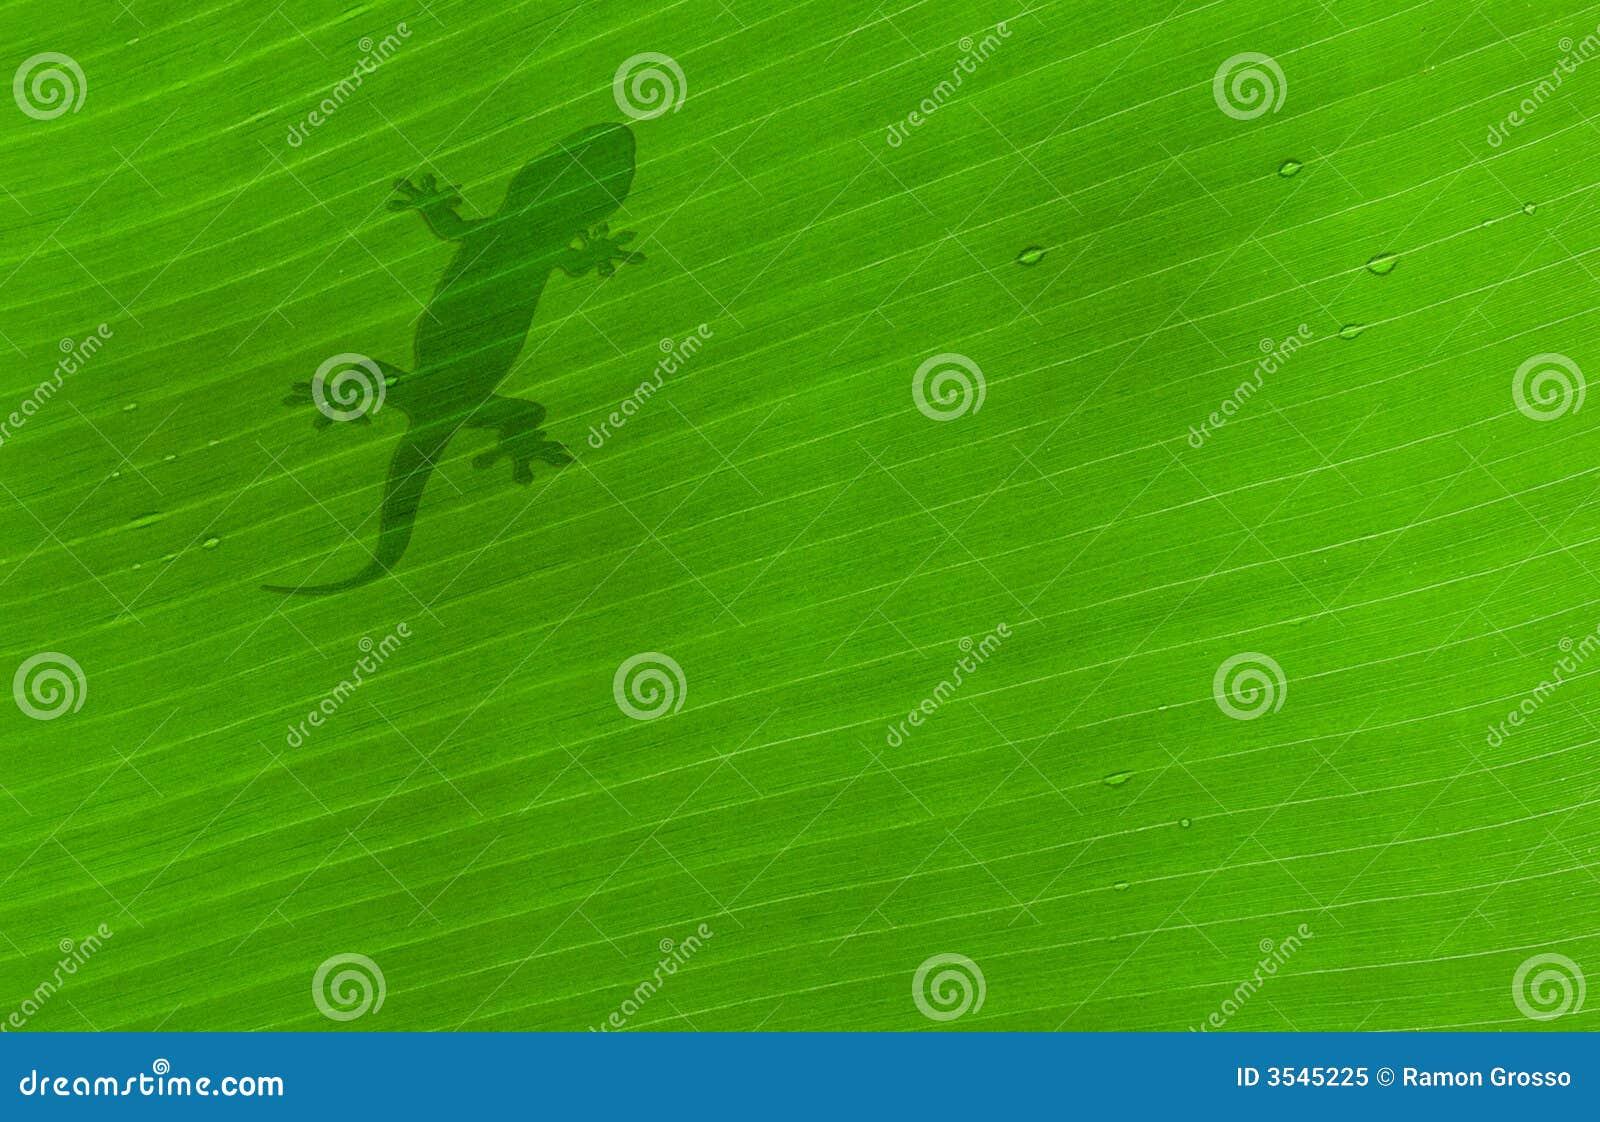 Klipsk leaf